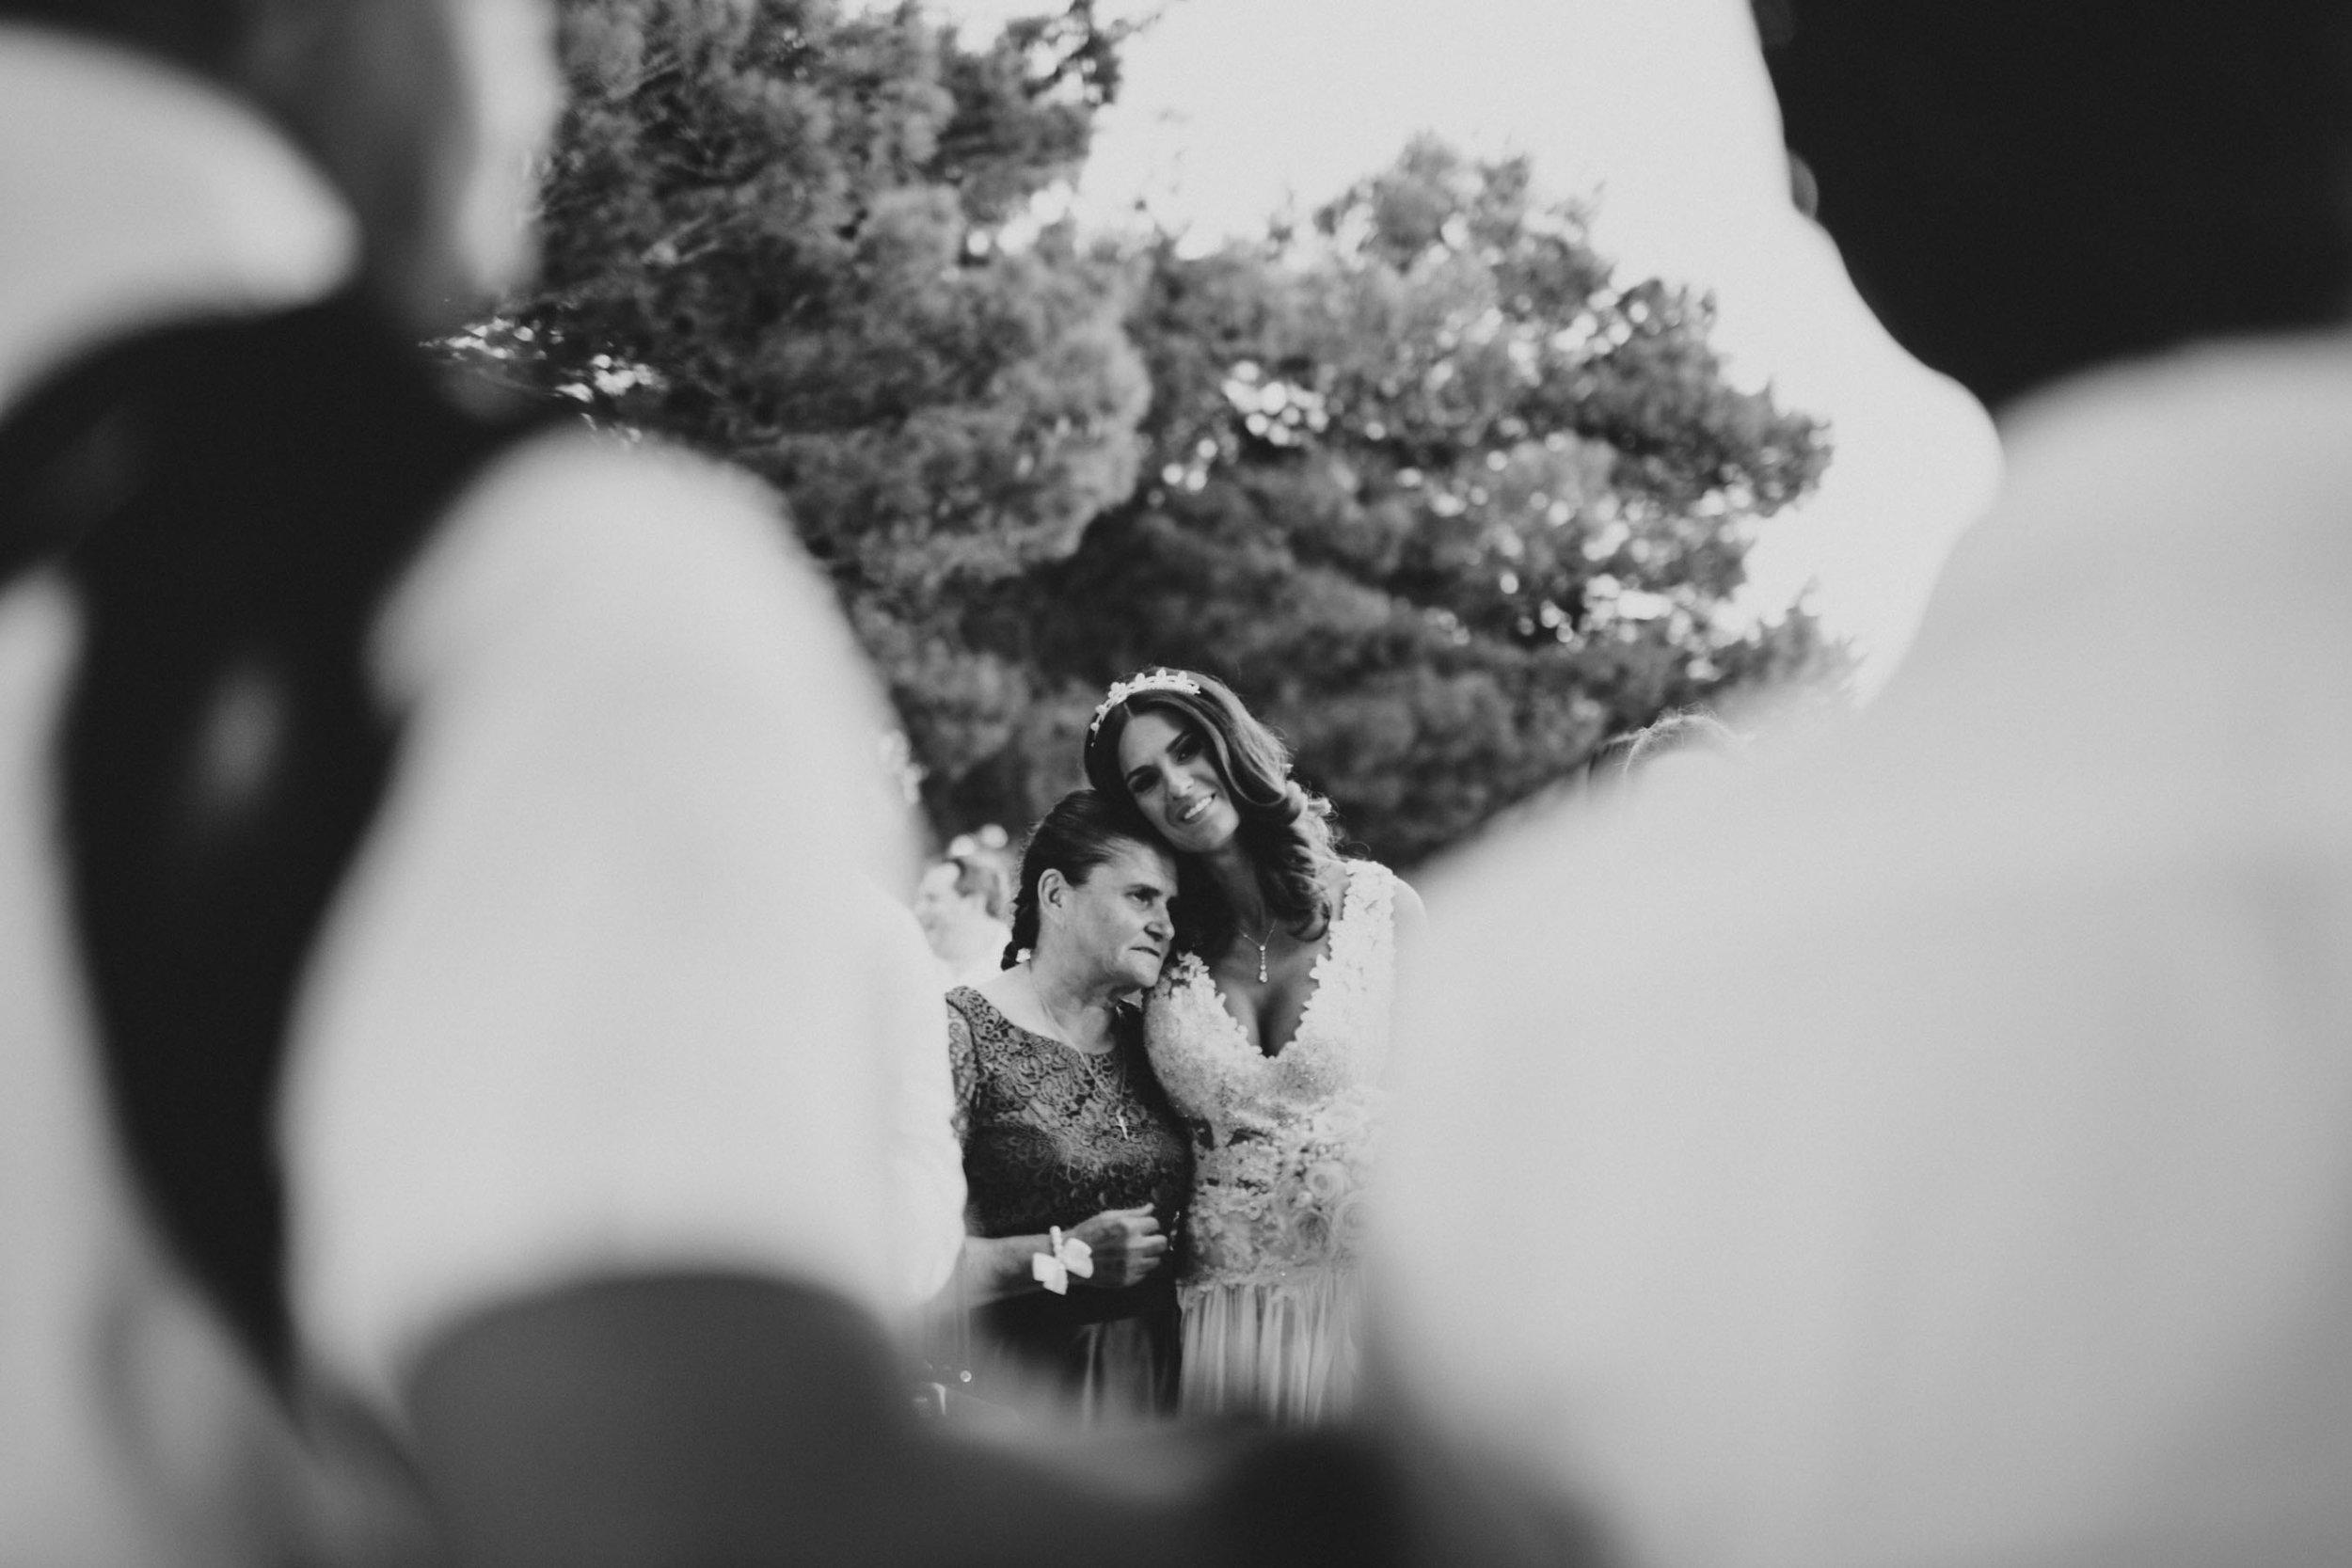 sylvia&dimitri-Wedding-Crvena_Luka-Croatia-52(6330).jpg